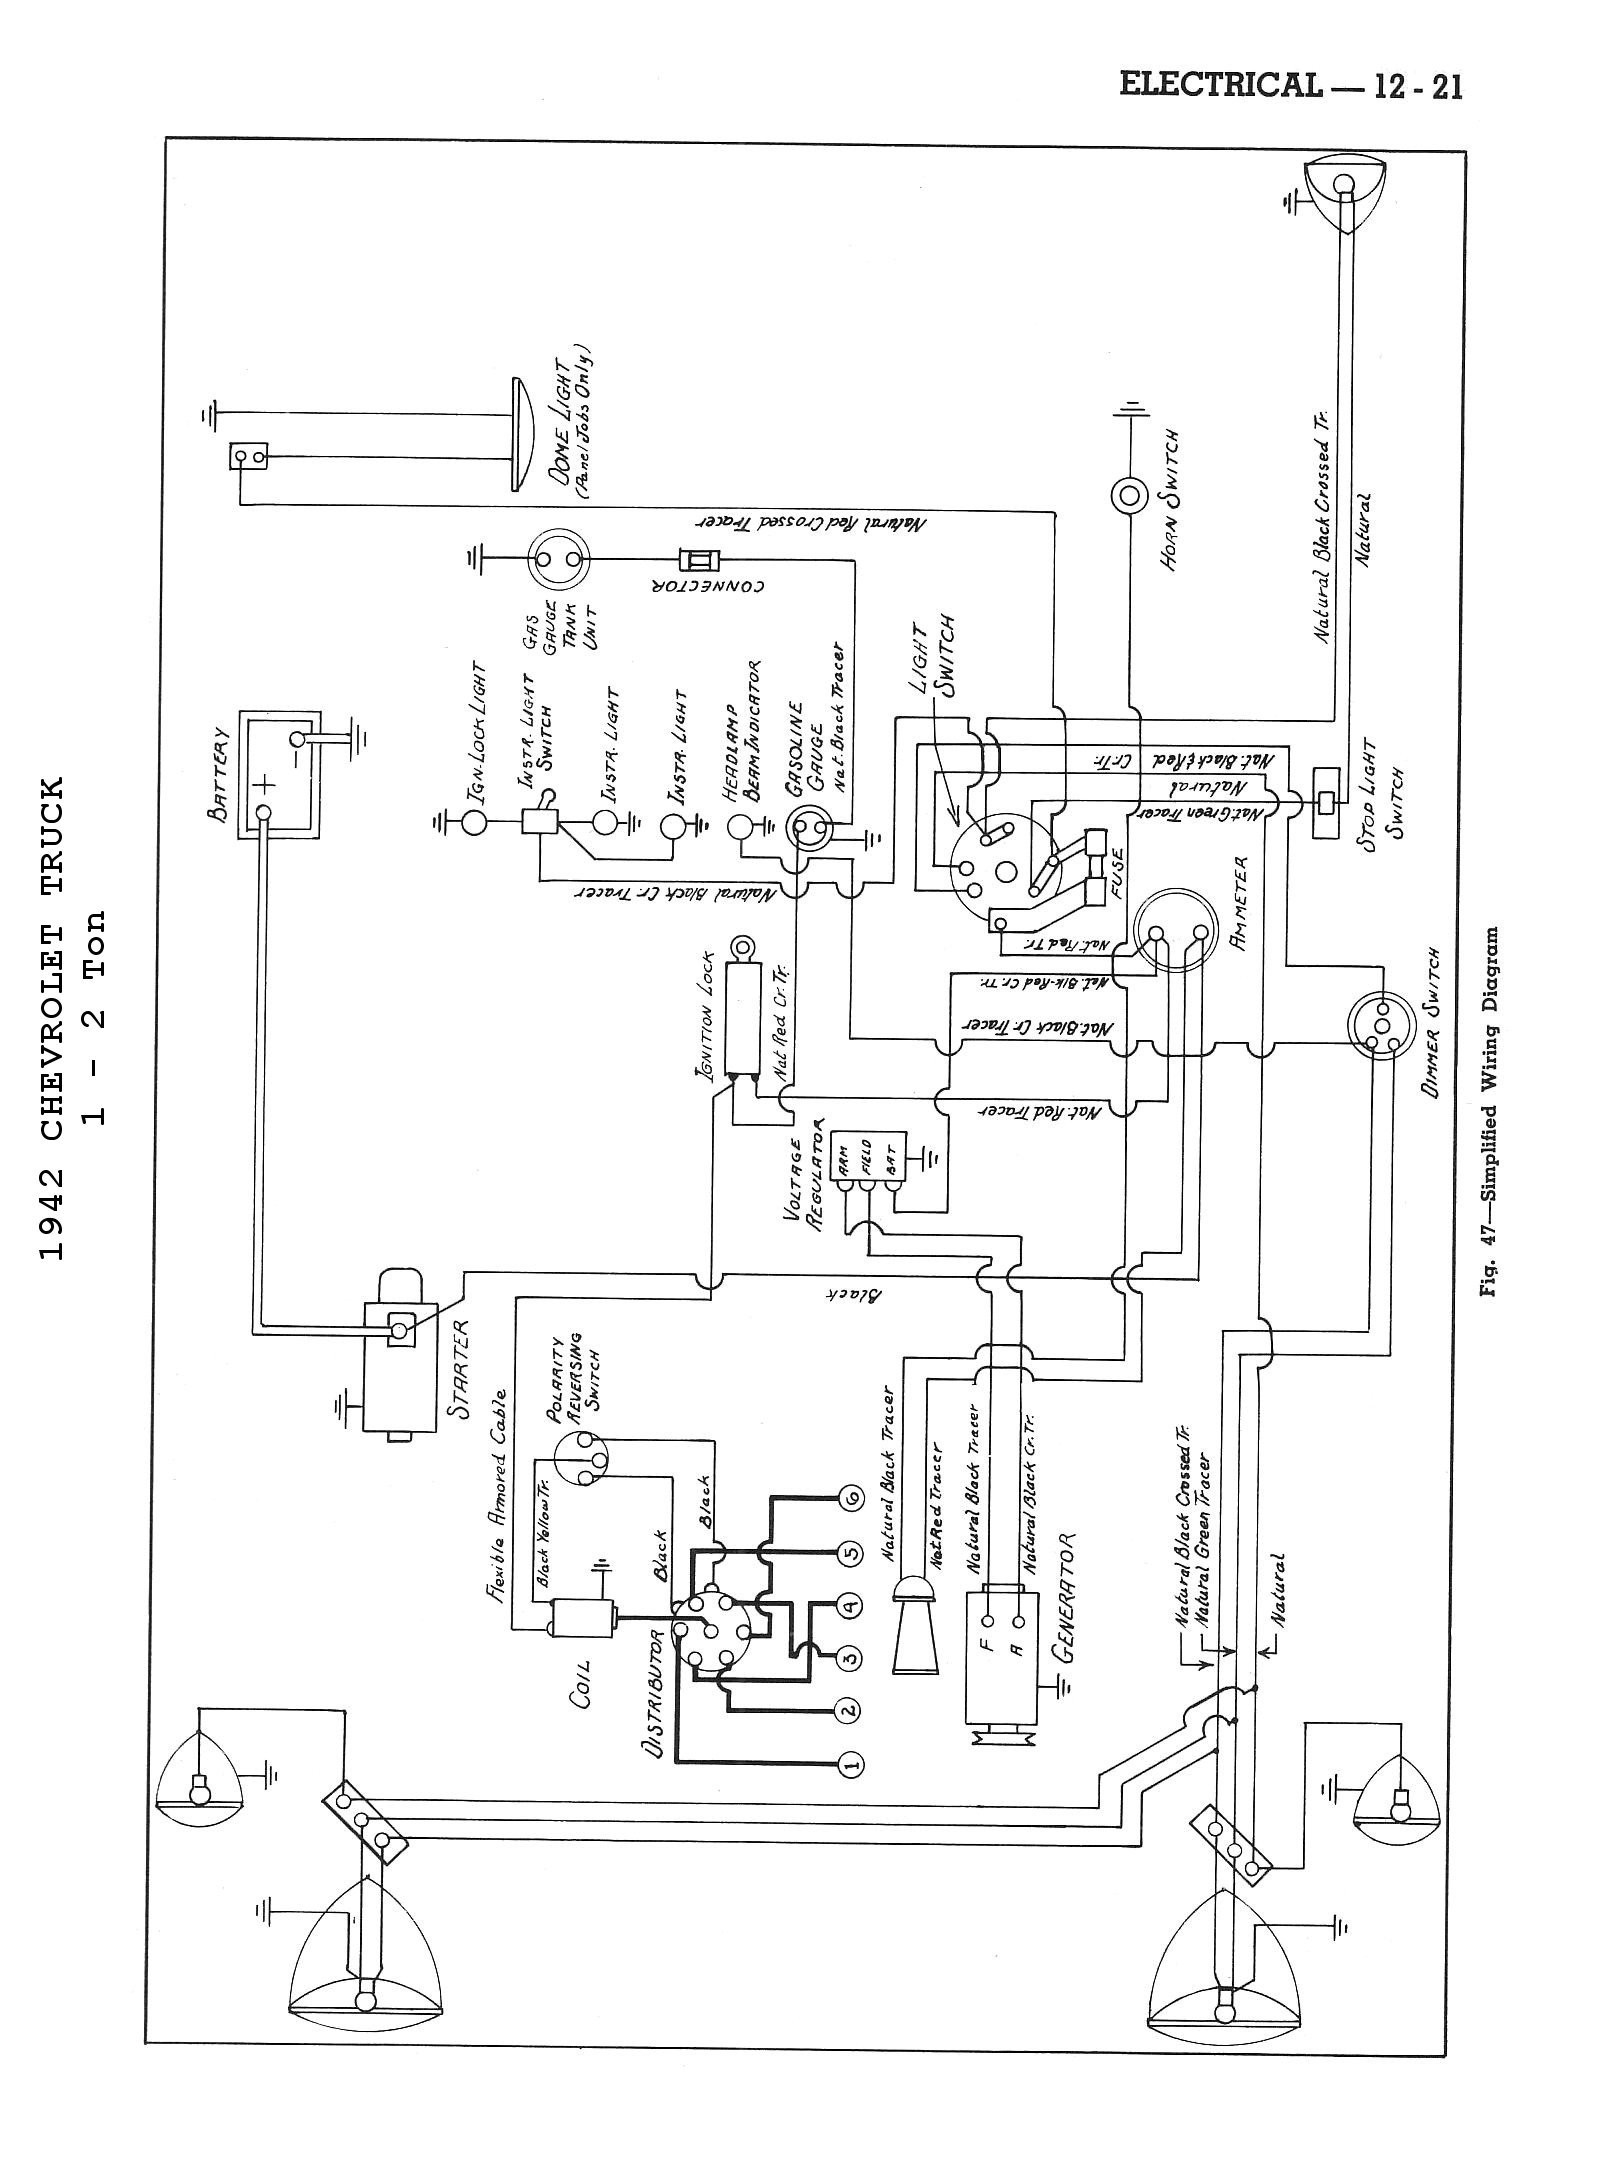 turn signal diagram